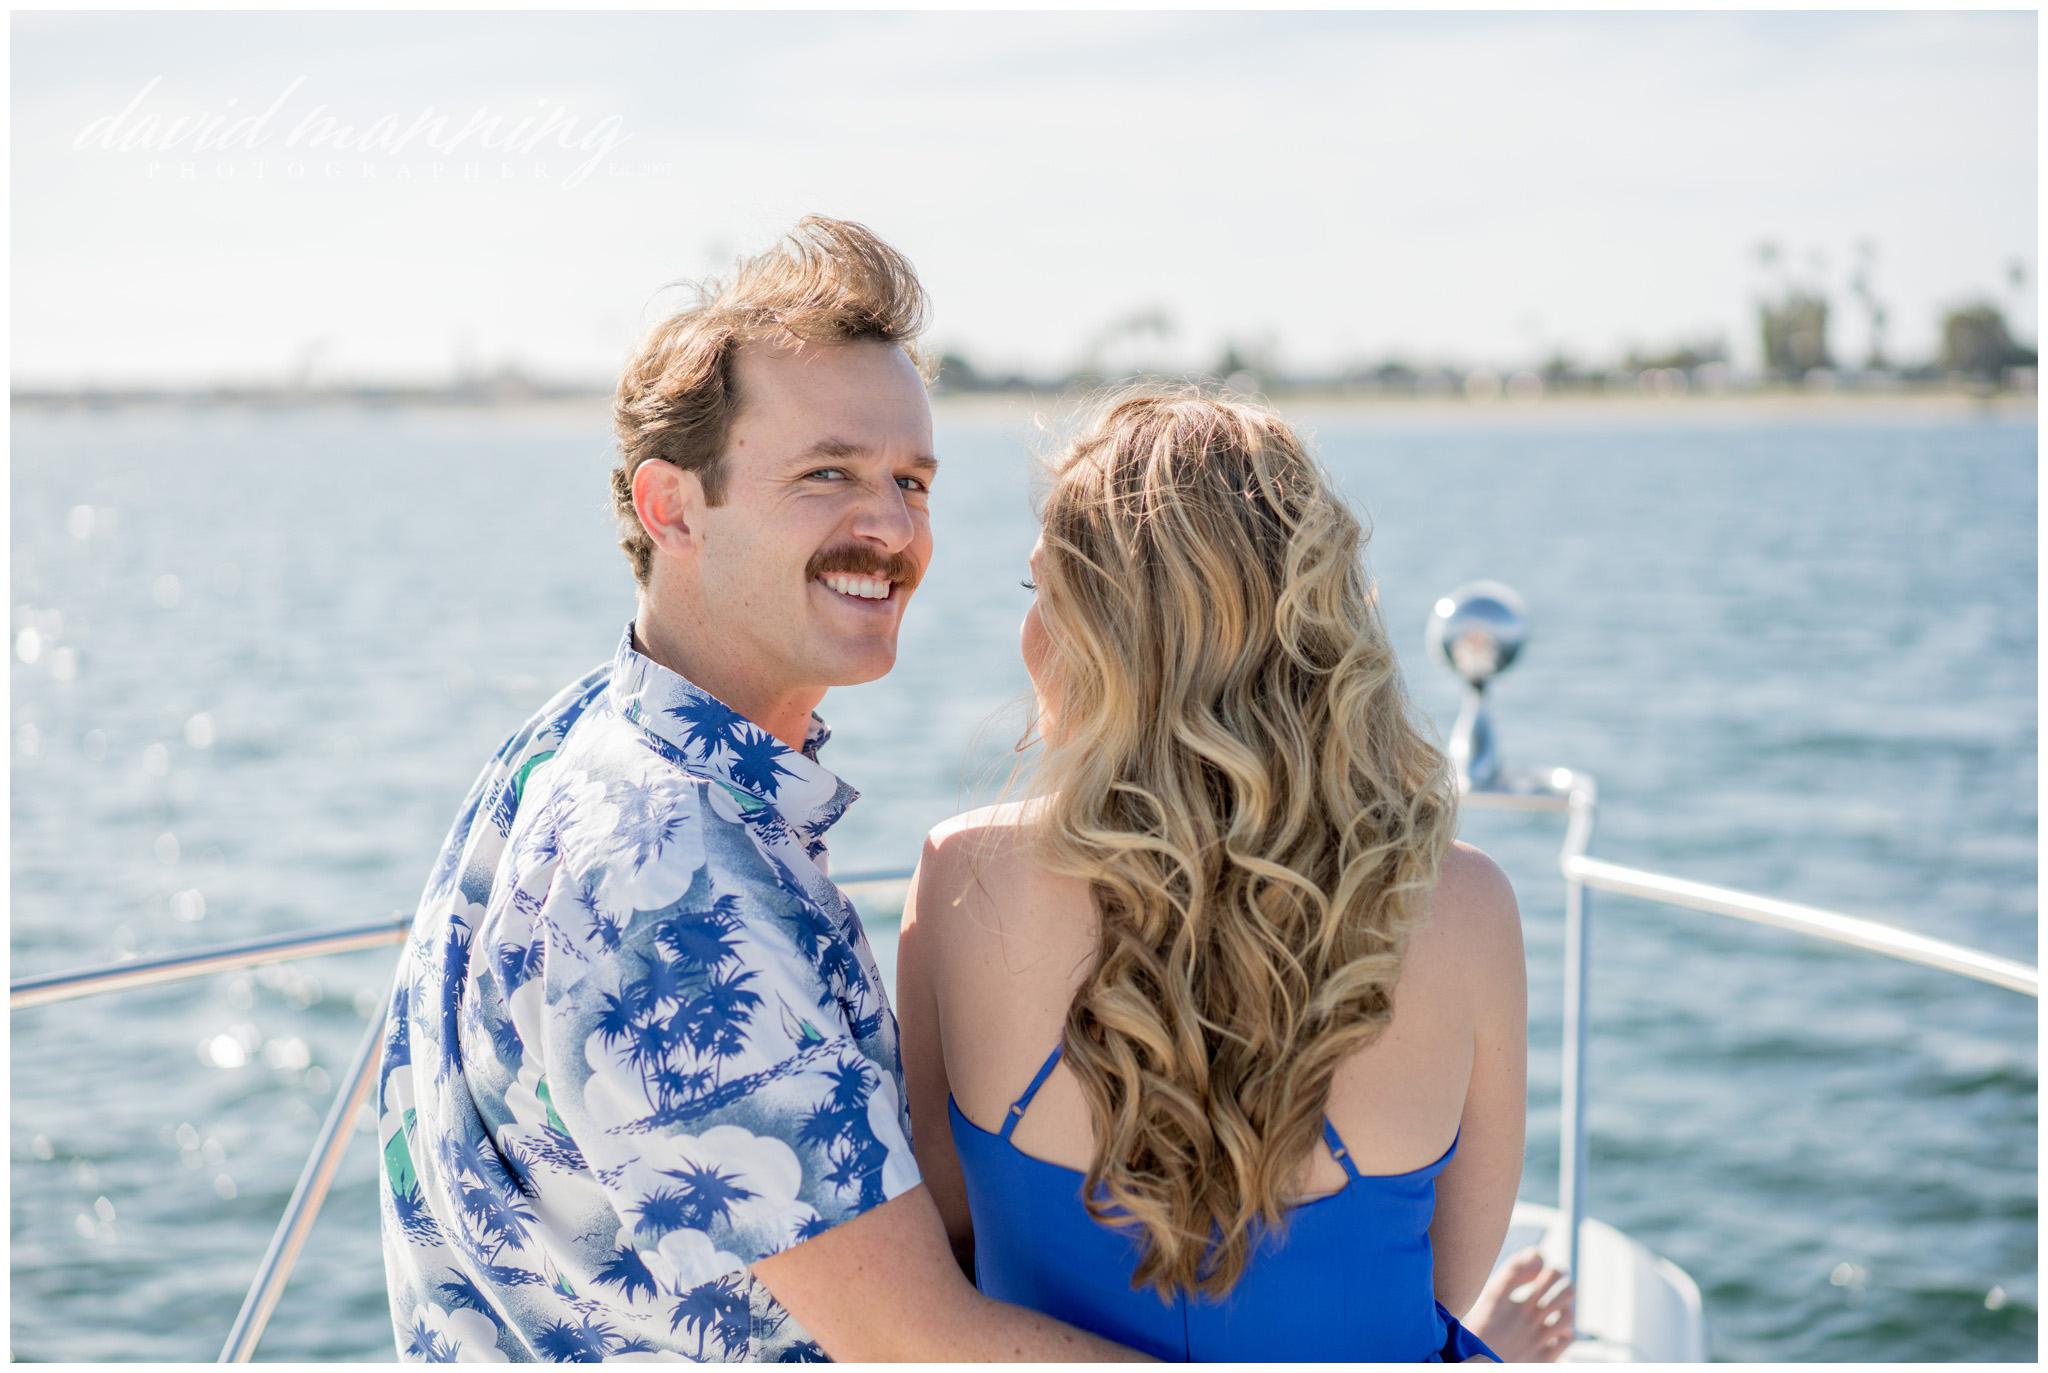 Alyssa-Taylor-Engagement-David-Manning-Photographer-0024.JPG